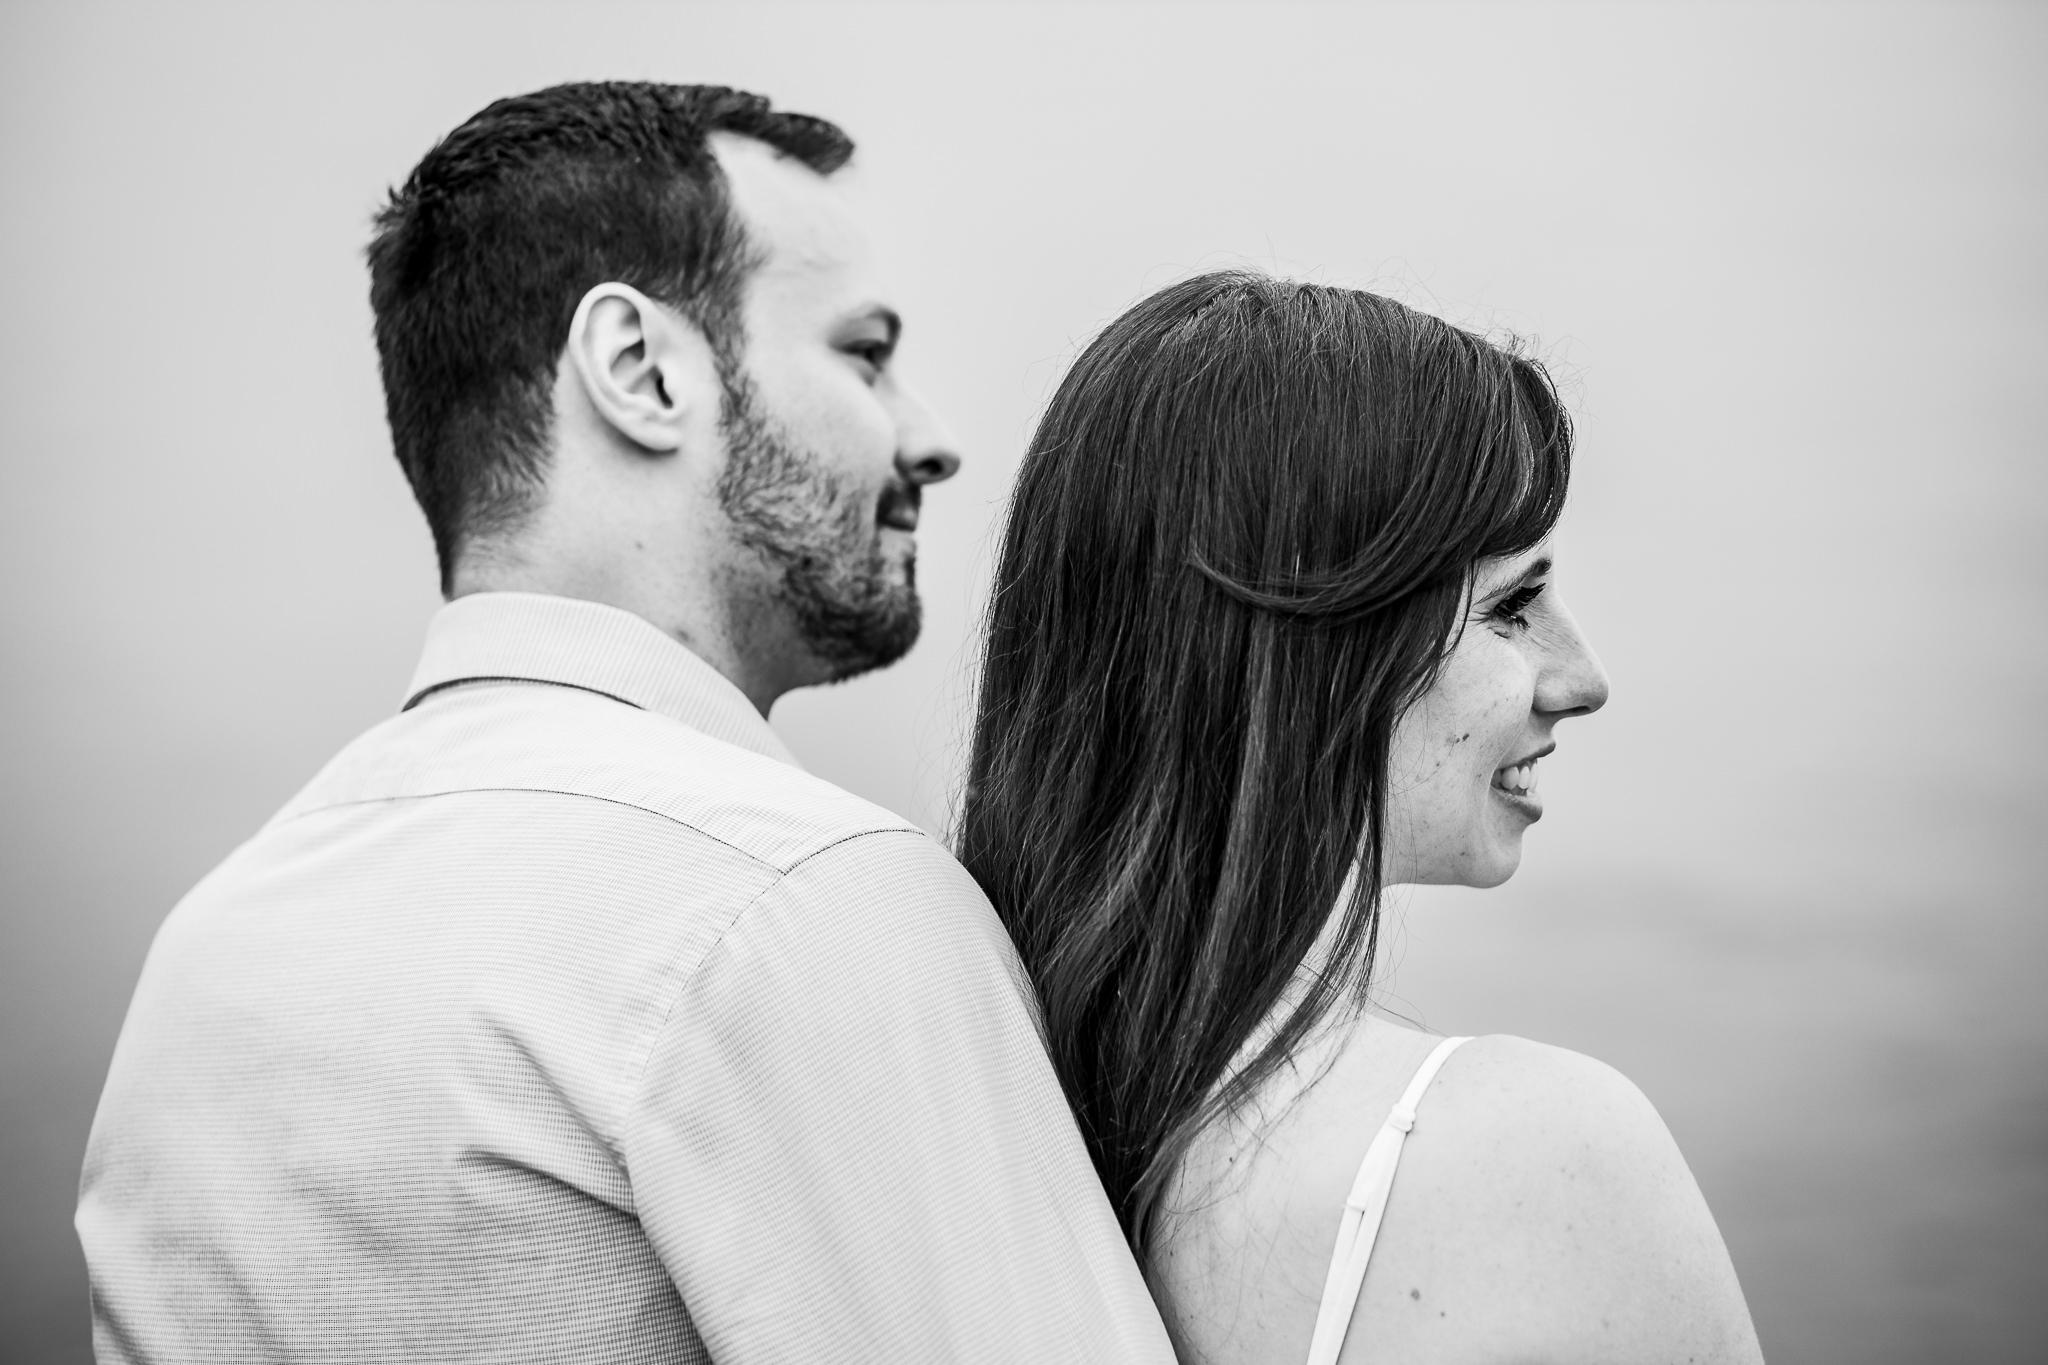 tobermory-engagement-photos-33.jpg